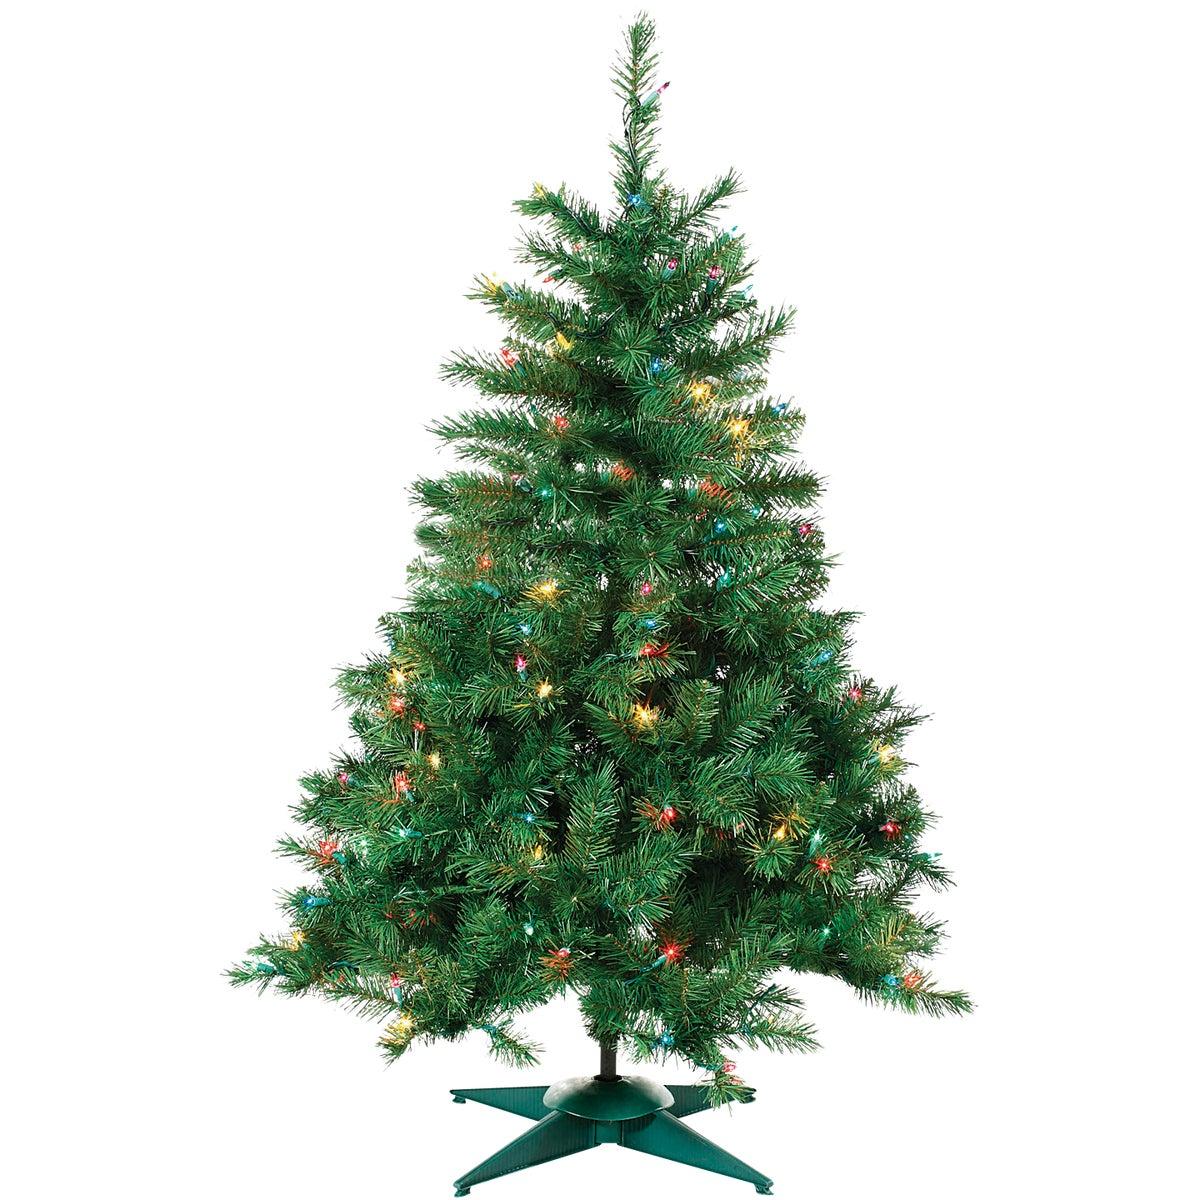 2'P/L COLRAD SPRUCE TREE